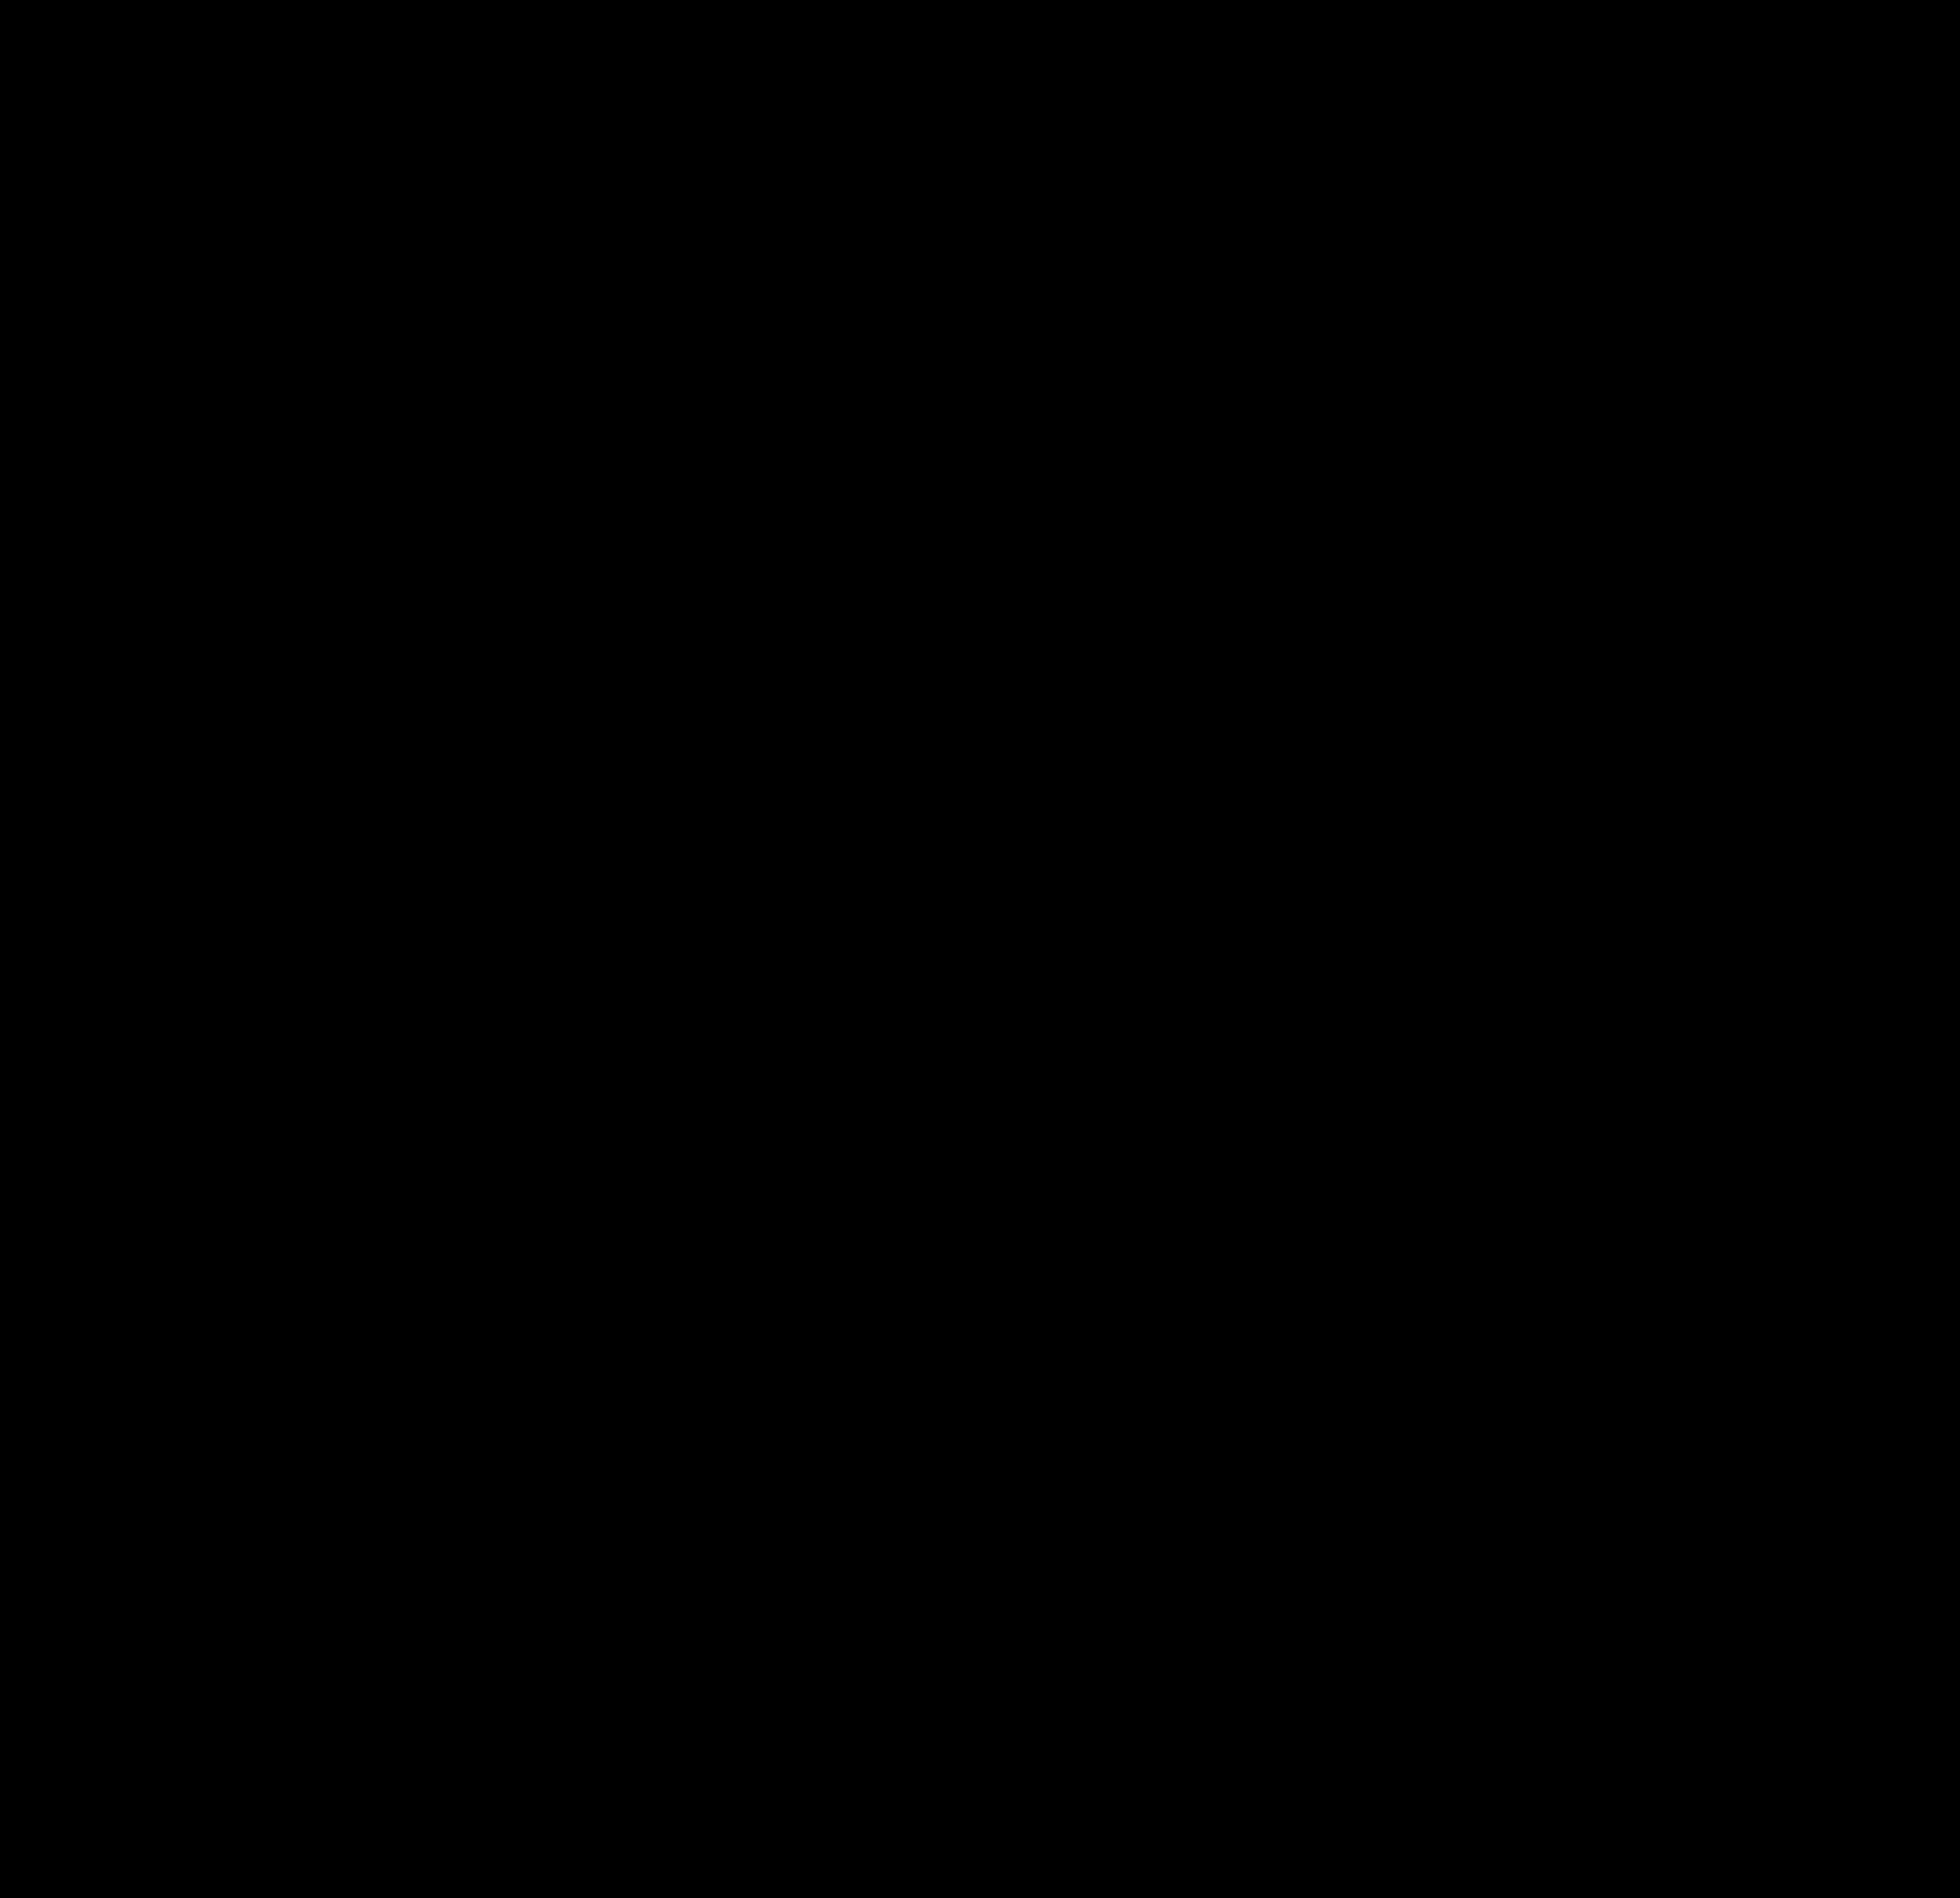 dancers silhouette clip art at getdrawings com free for personal rh getdrawings com